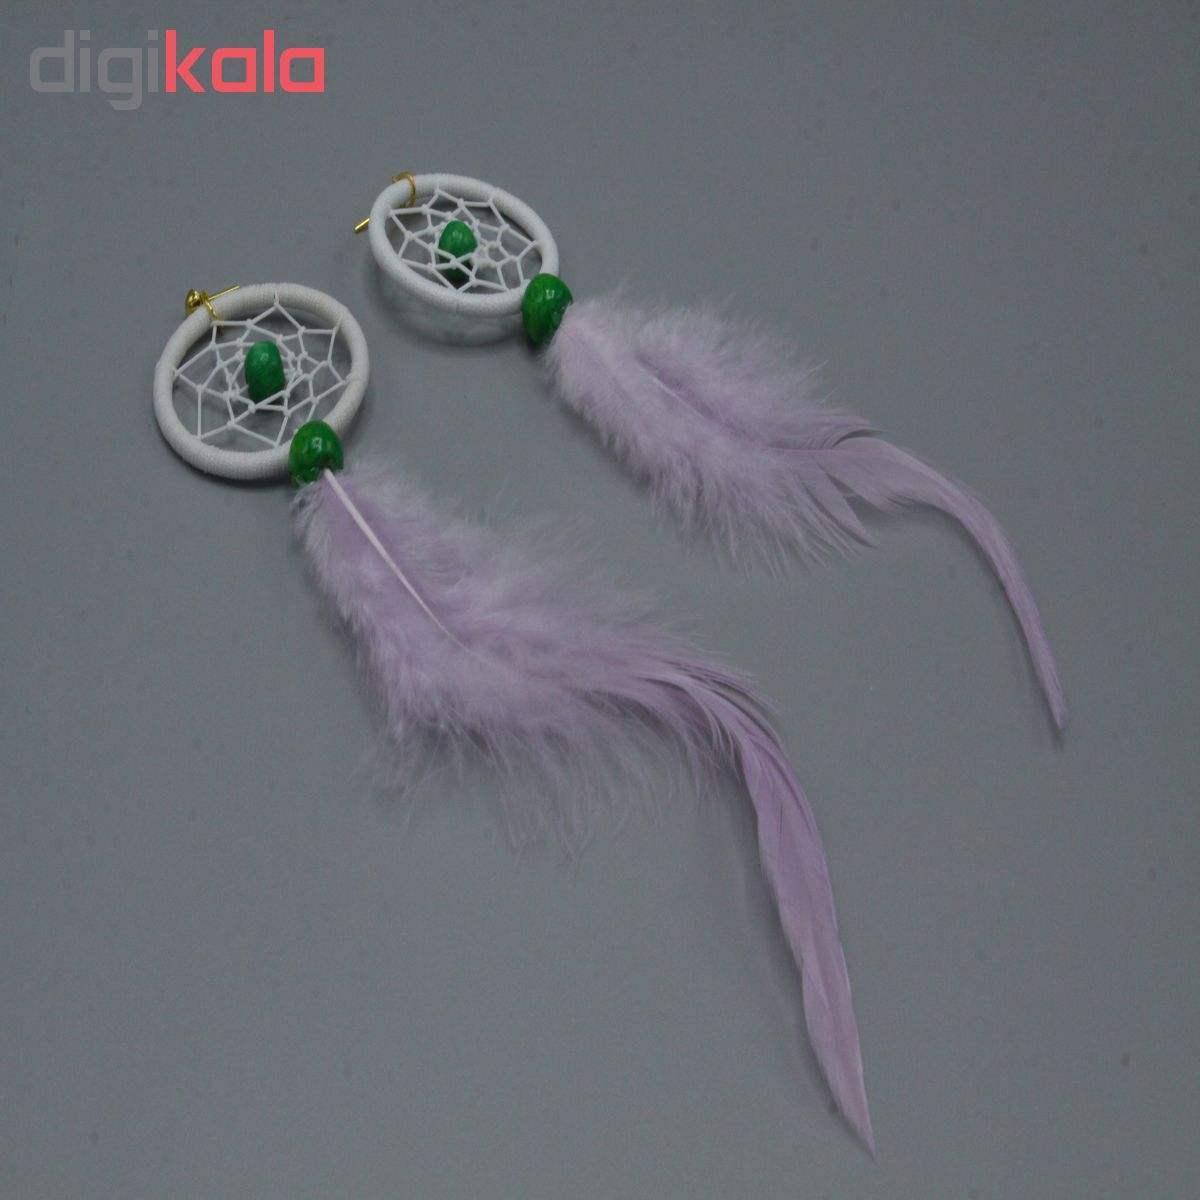 گوشواره زنانه طرح دریم کچر مدل SD 008 main 1 2